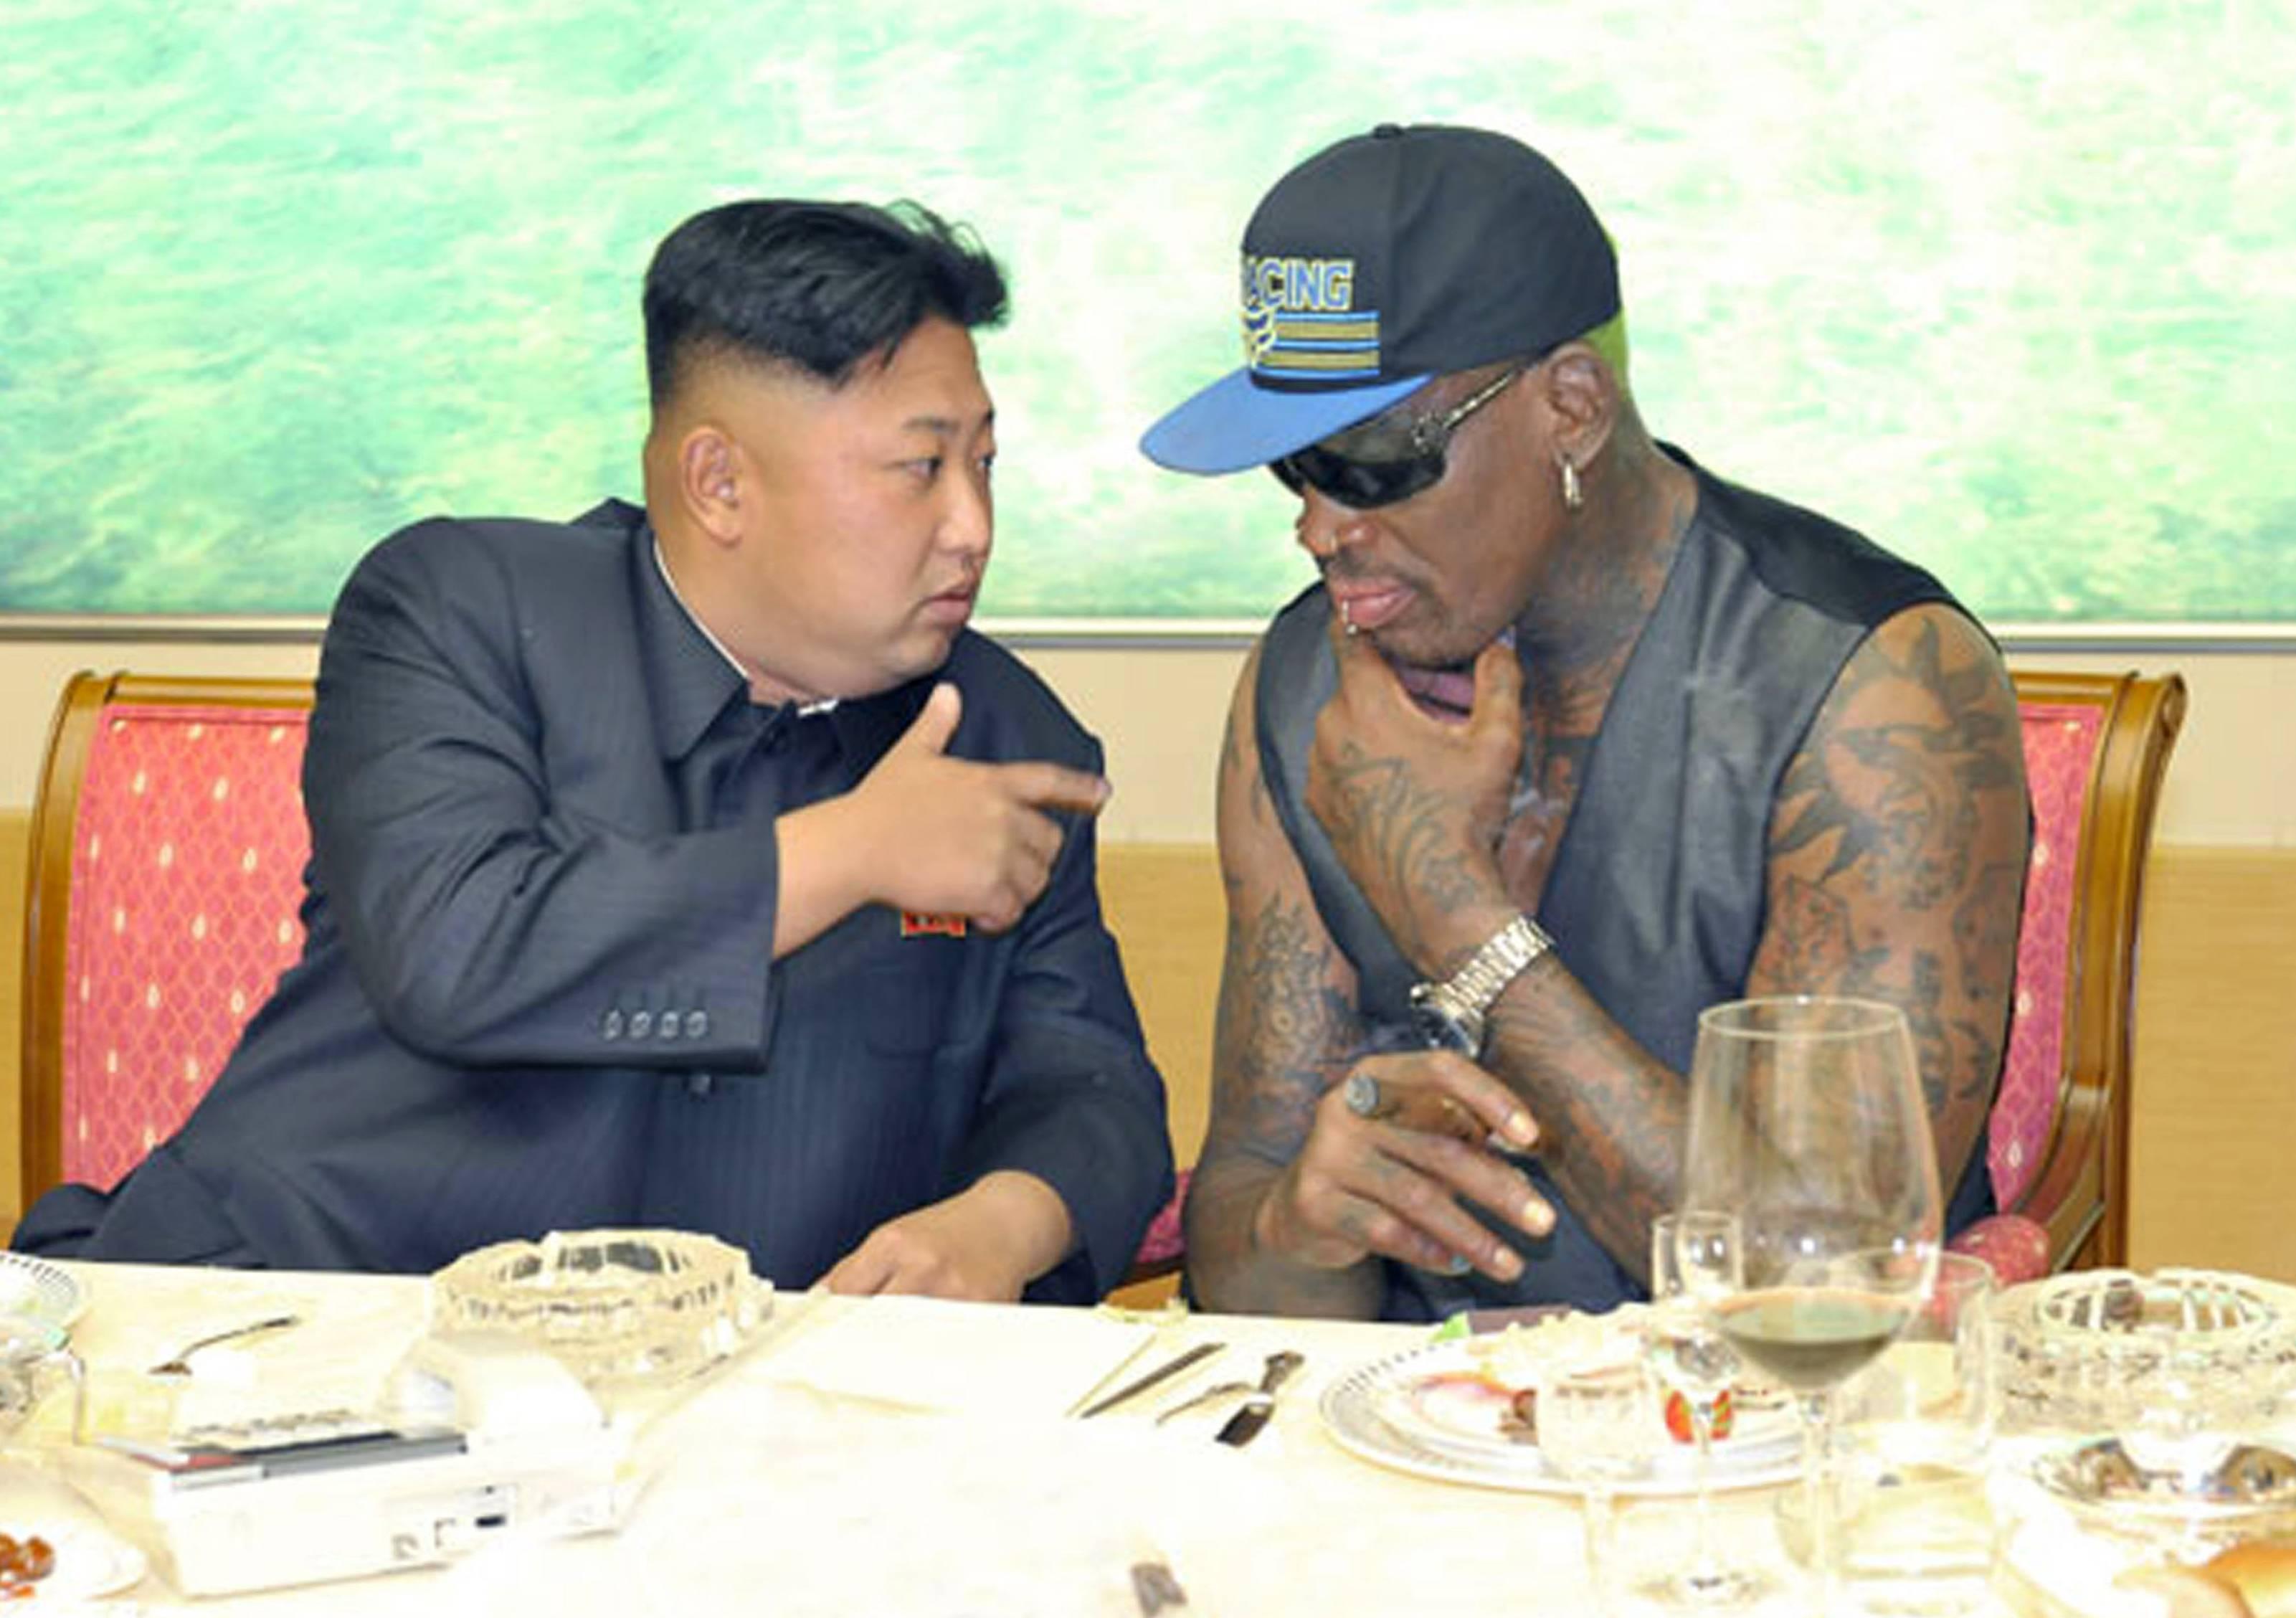 northkorearodmanpuer2-6c5d533a13e42ea877df465b368b2d01.jpg